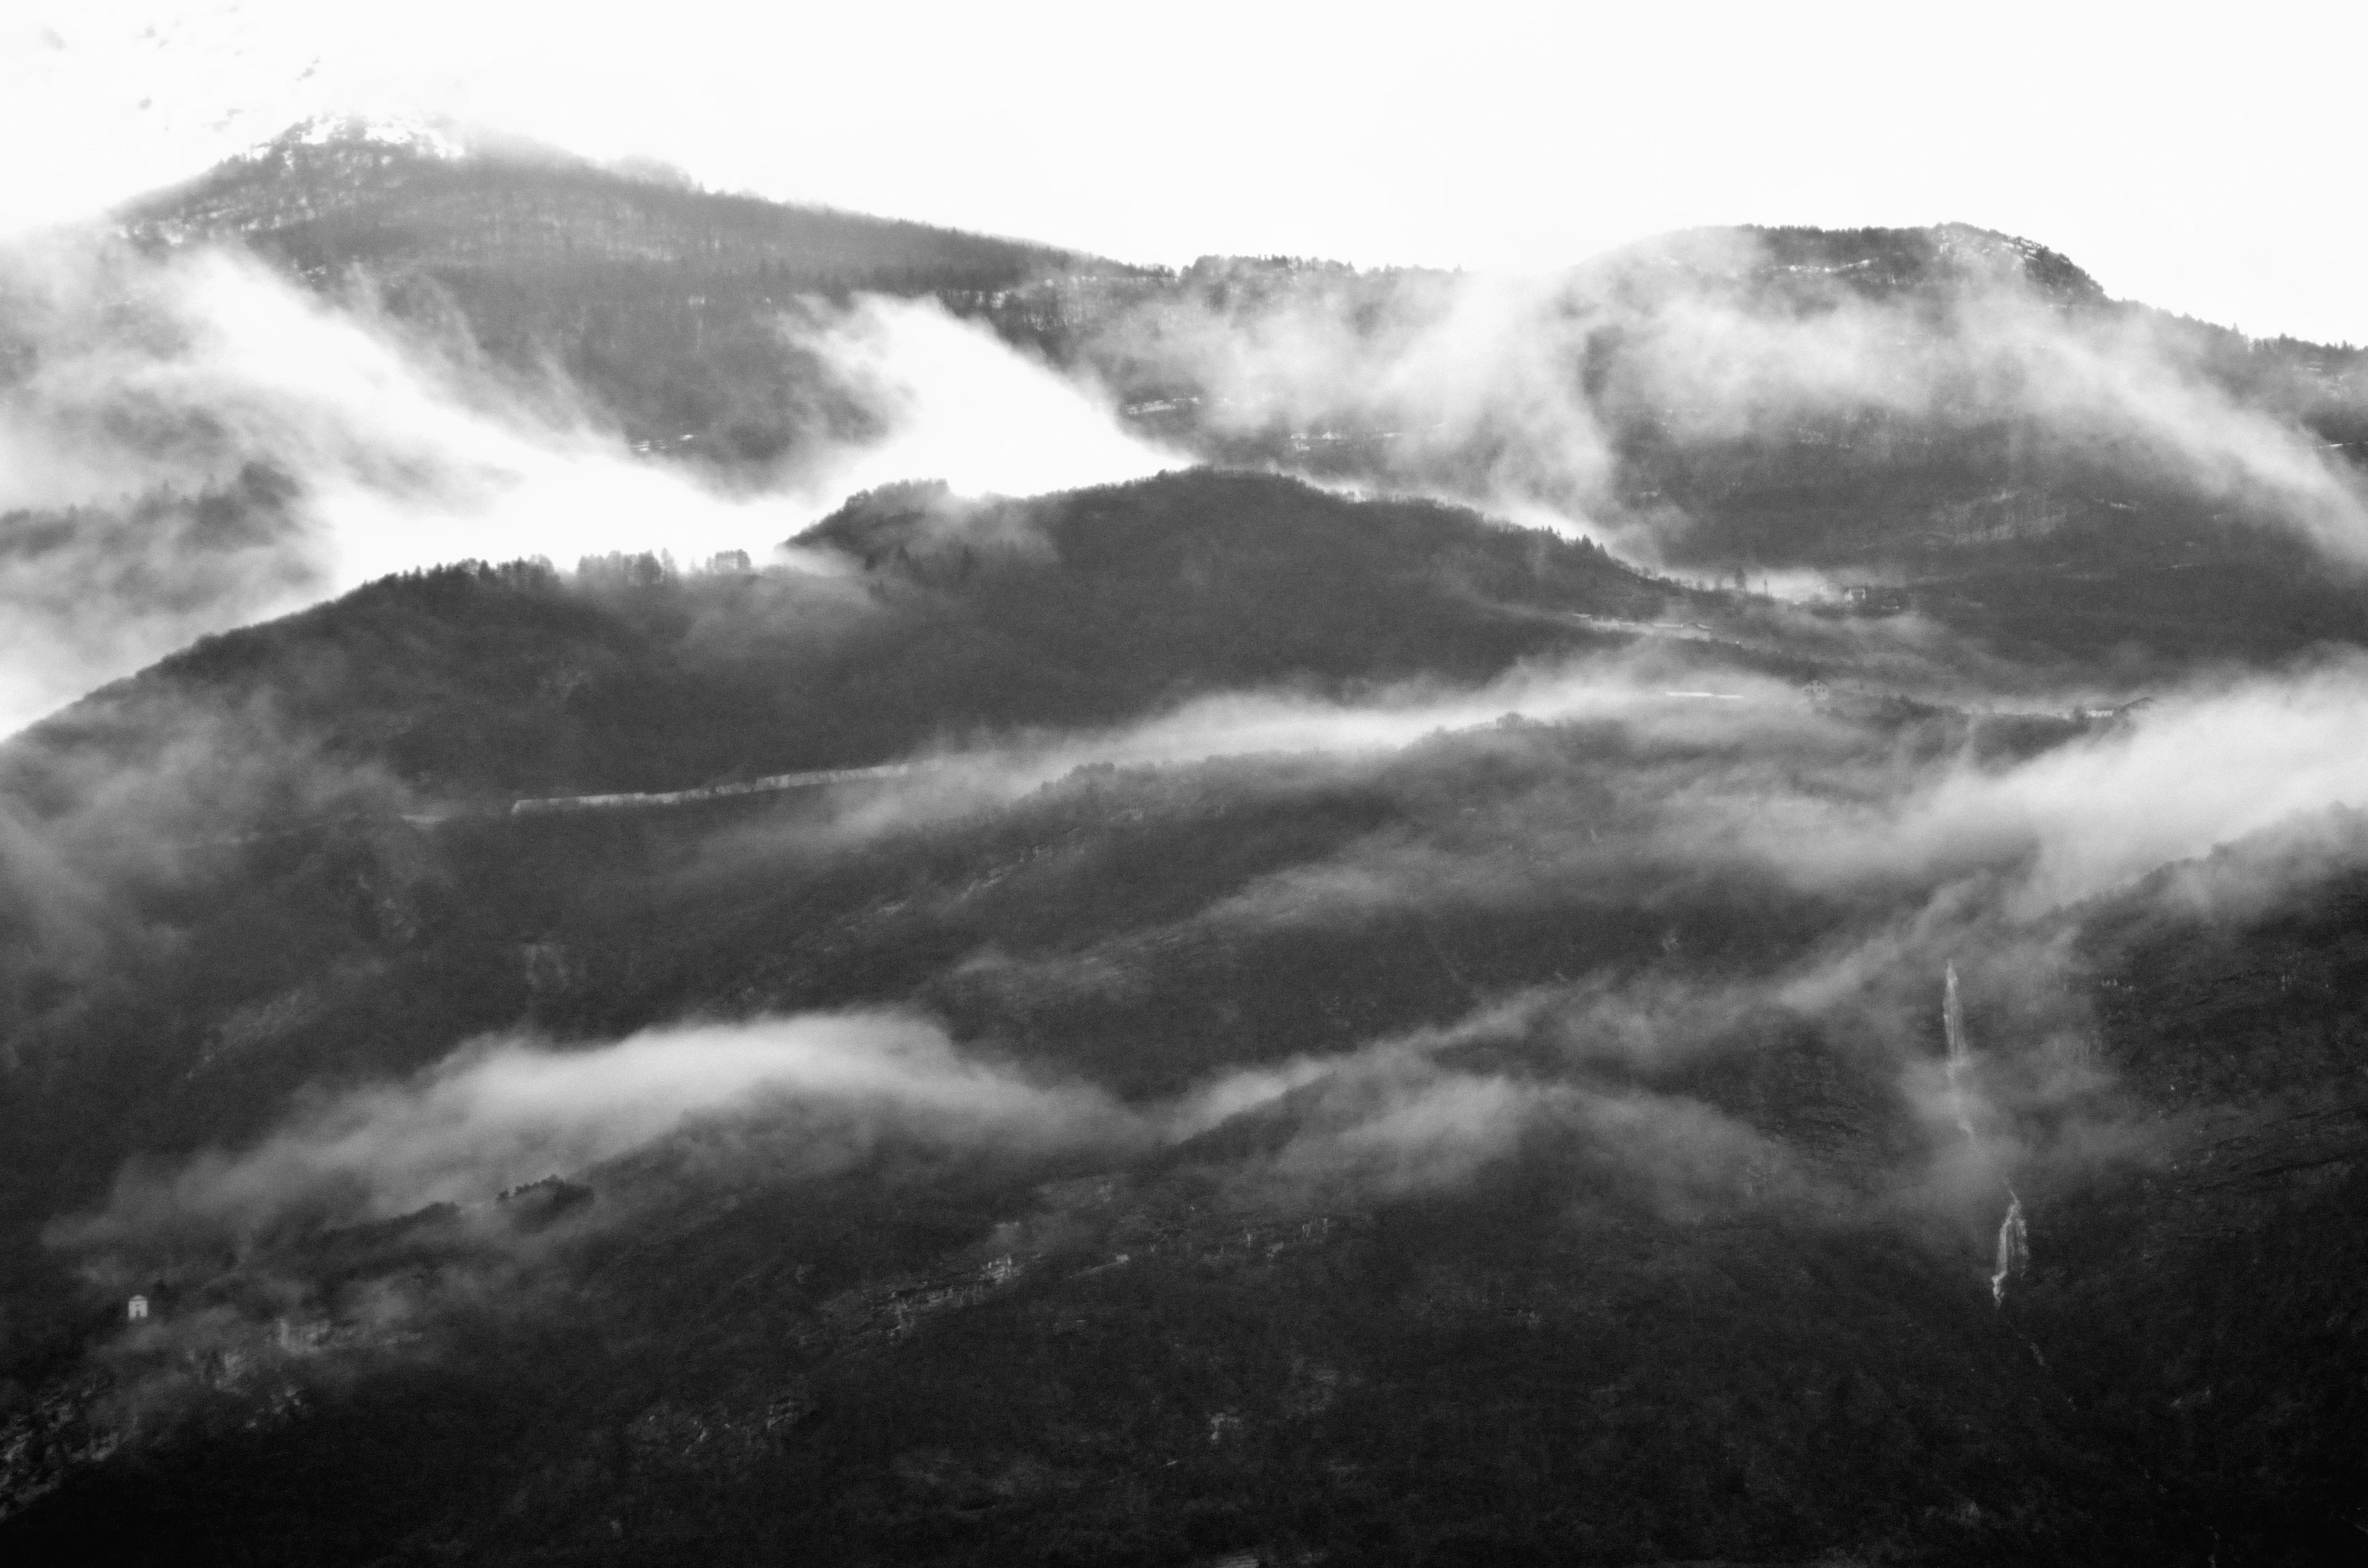 Nuvole Basse in Bianco Nero (NB-BN)